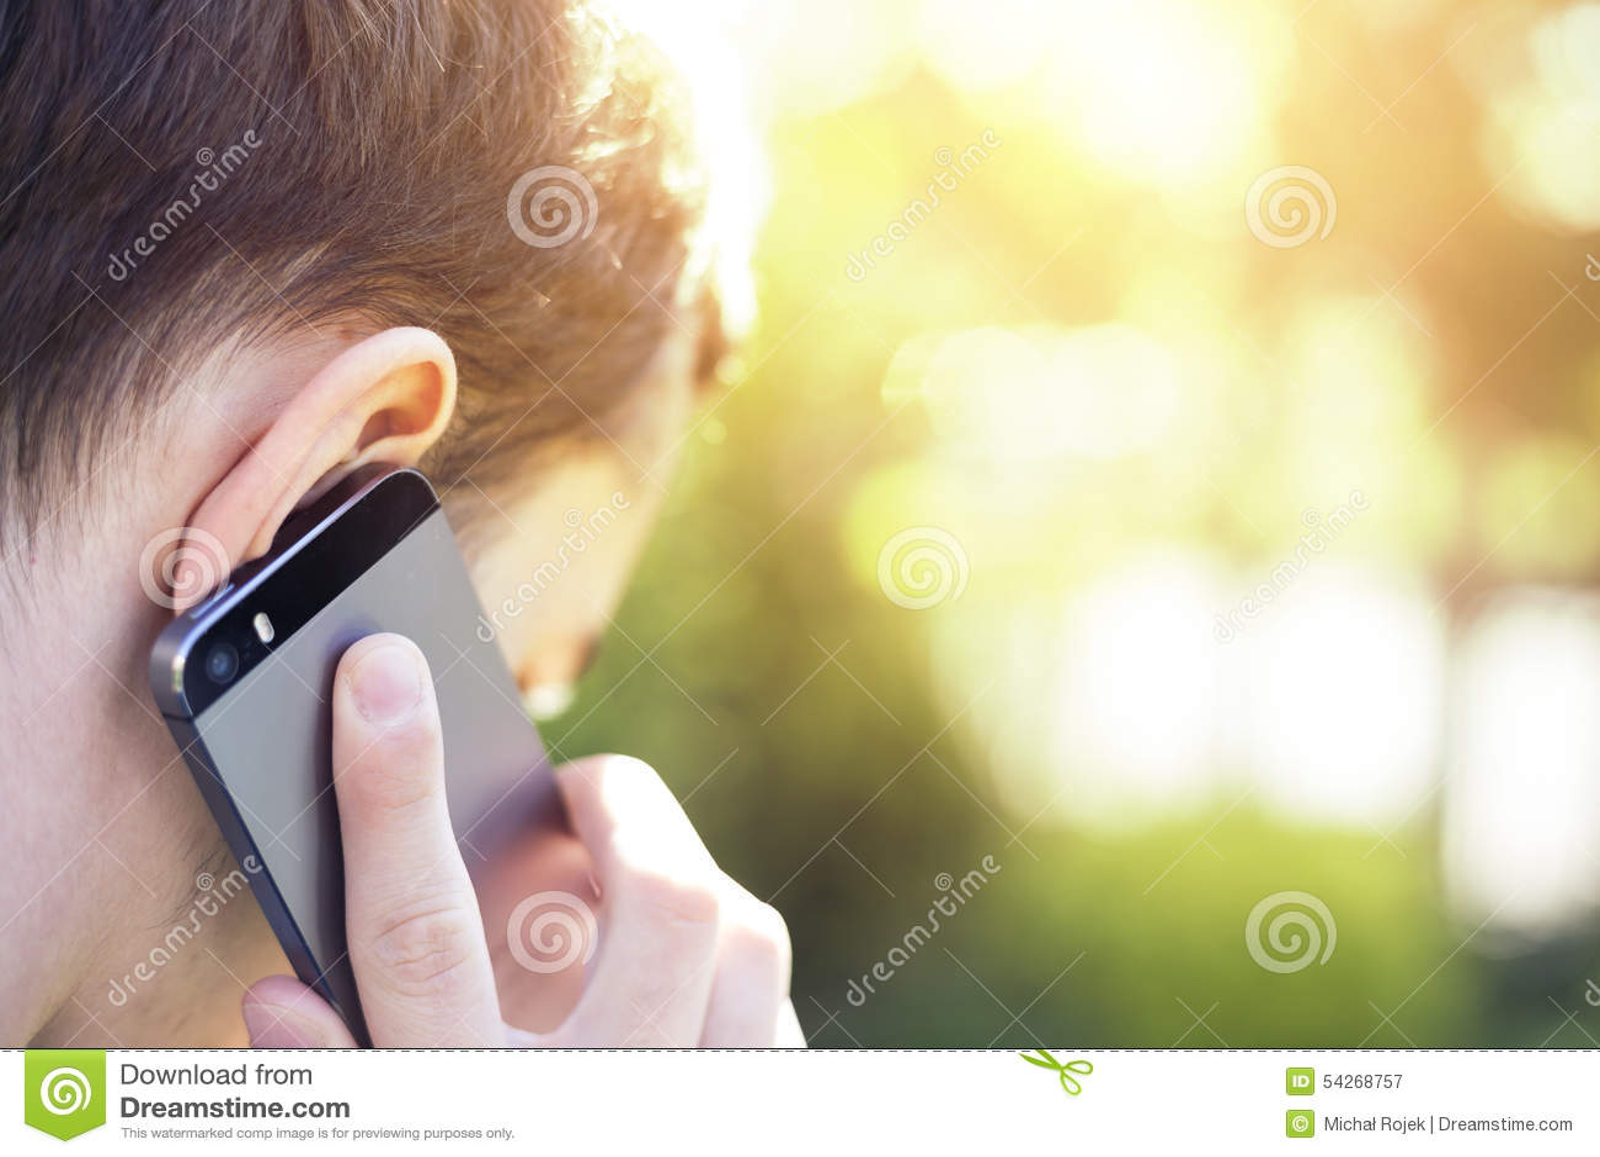 Man talking on the phone.